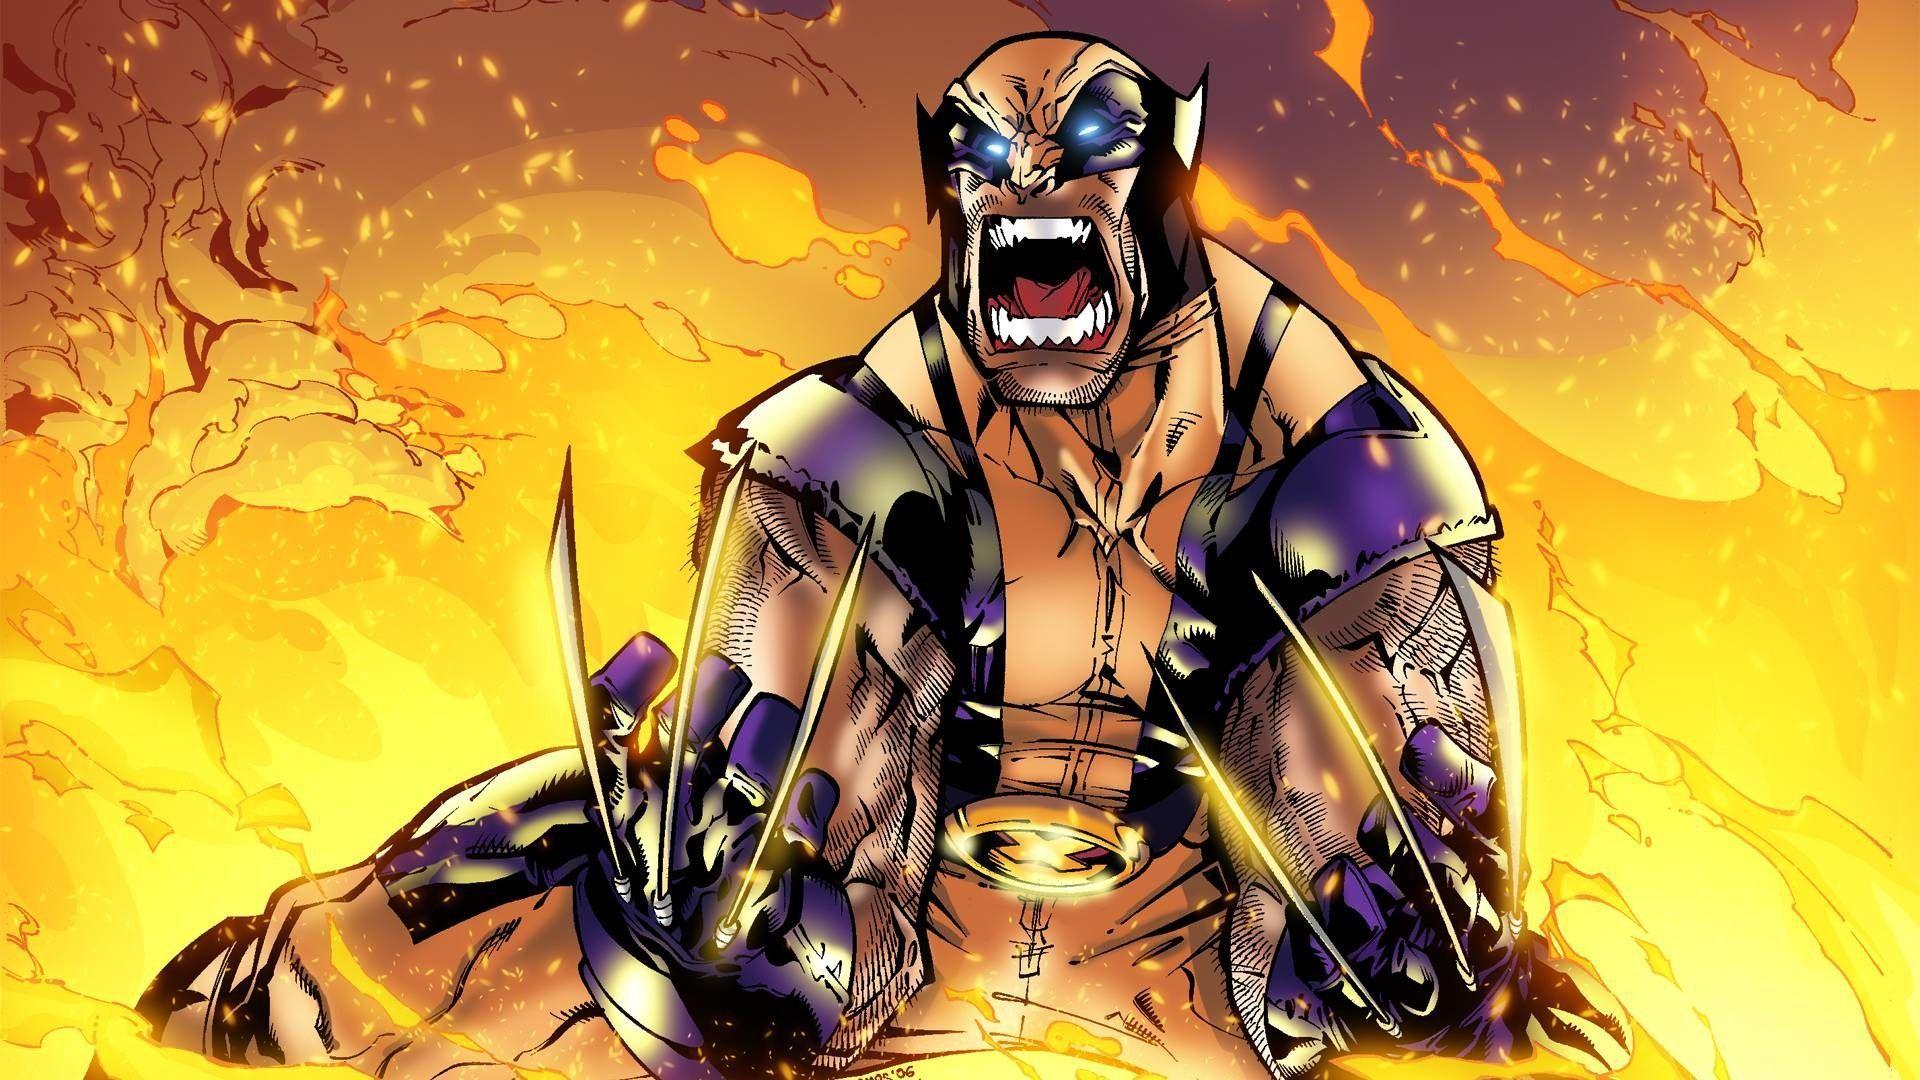 Wolverine Cartoon Wallpapers Top Free Wolverine Cartoon